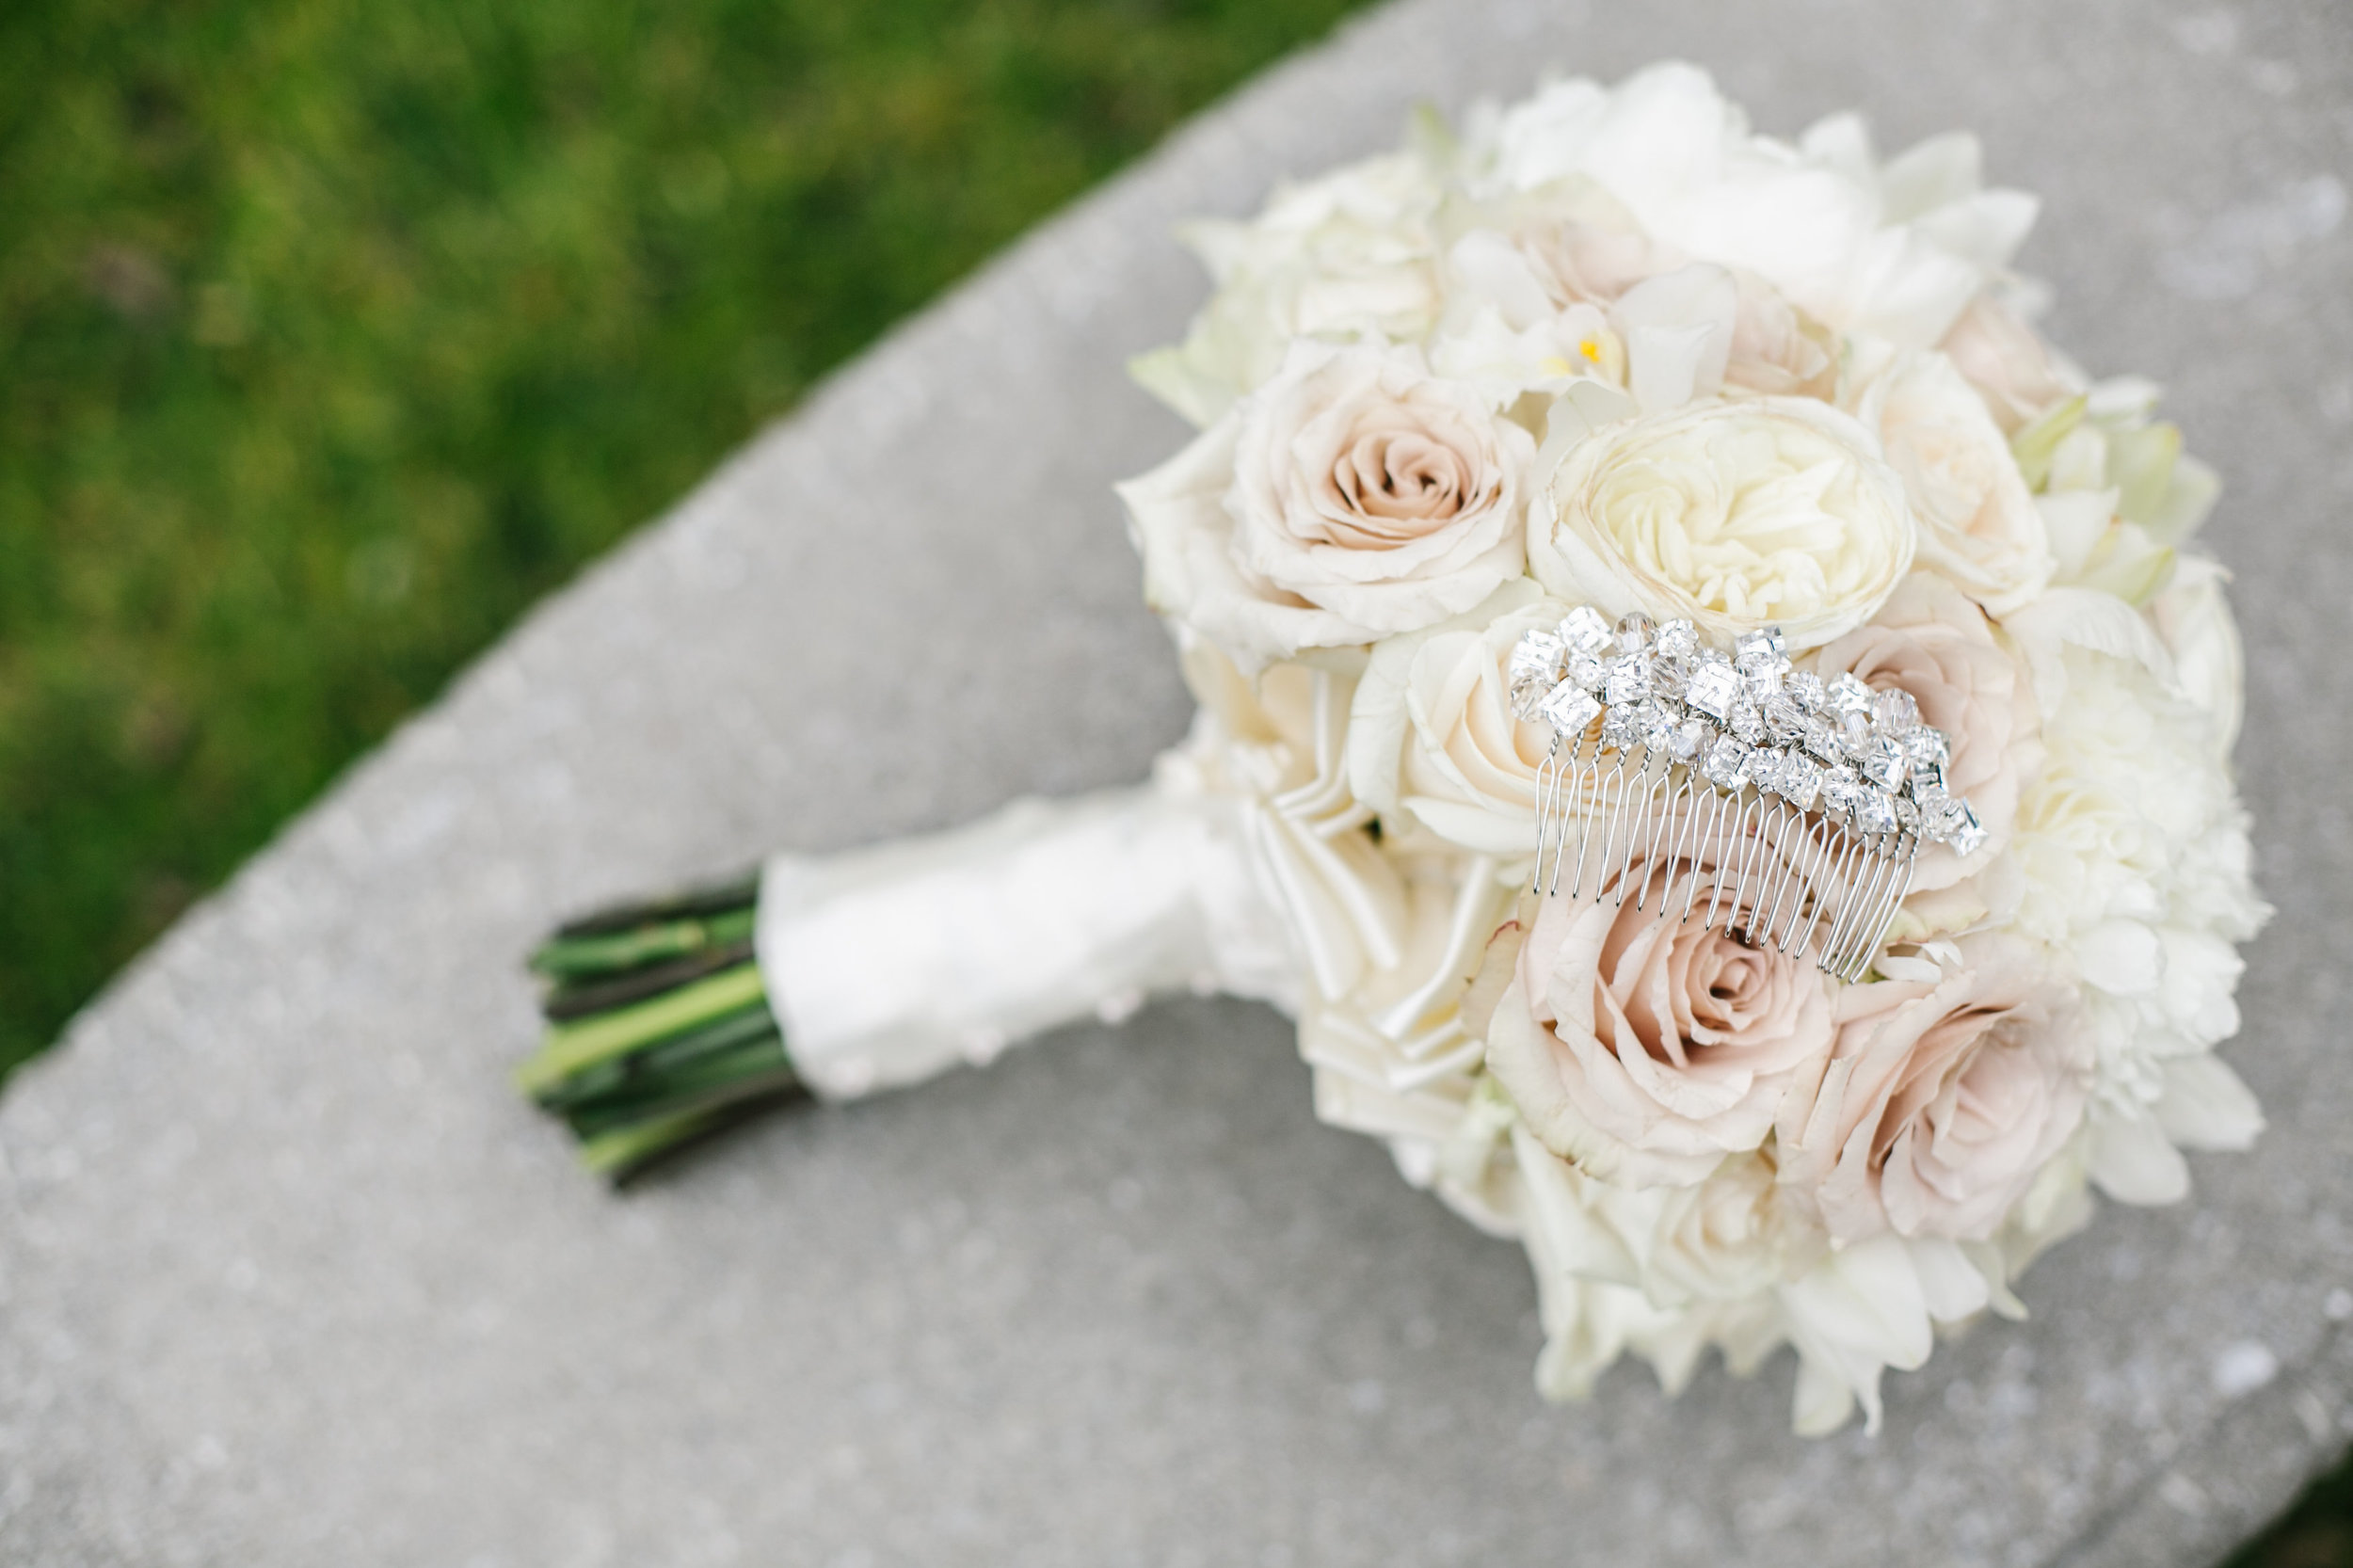 Ceci_New_York_Custom_Invitation_ New_Jersey_Wedding_Luxury_Personalized_Ceci_Style_Bride_Foil_Stamping3.jpg